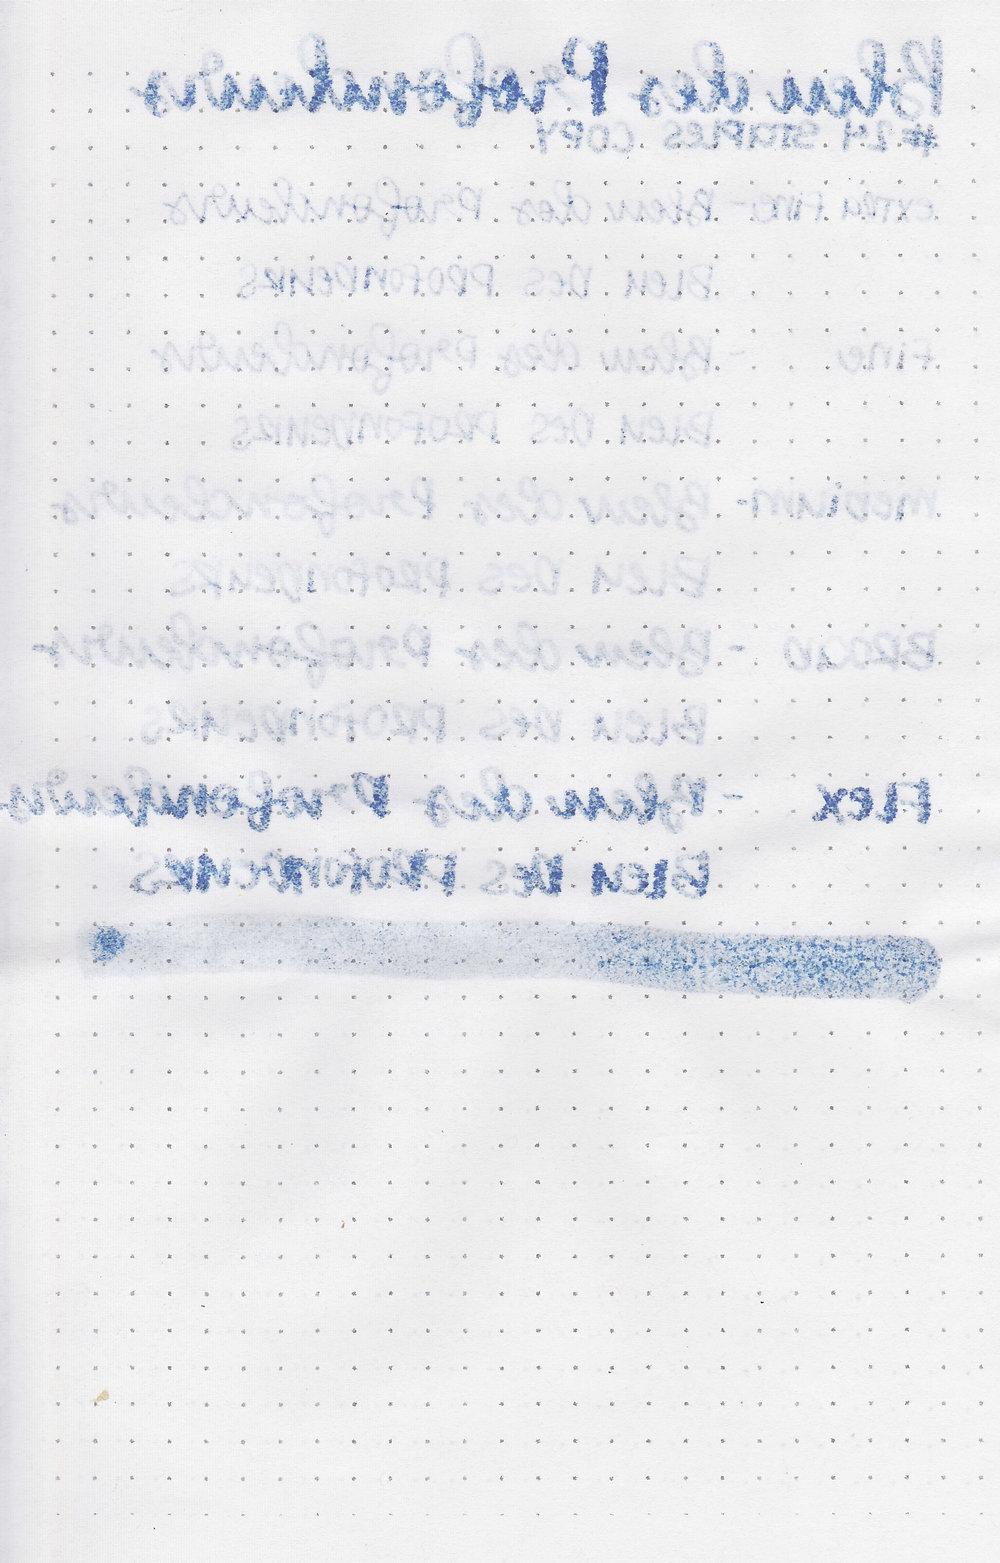 jh-bleu-des-profondeurs-12.jpg